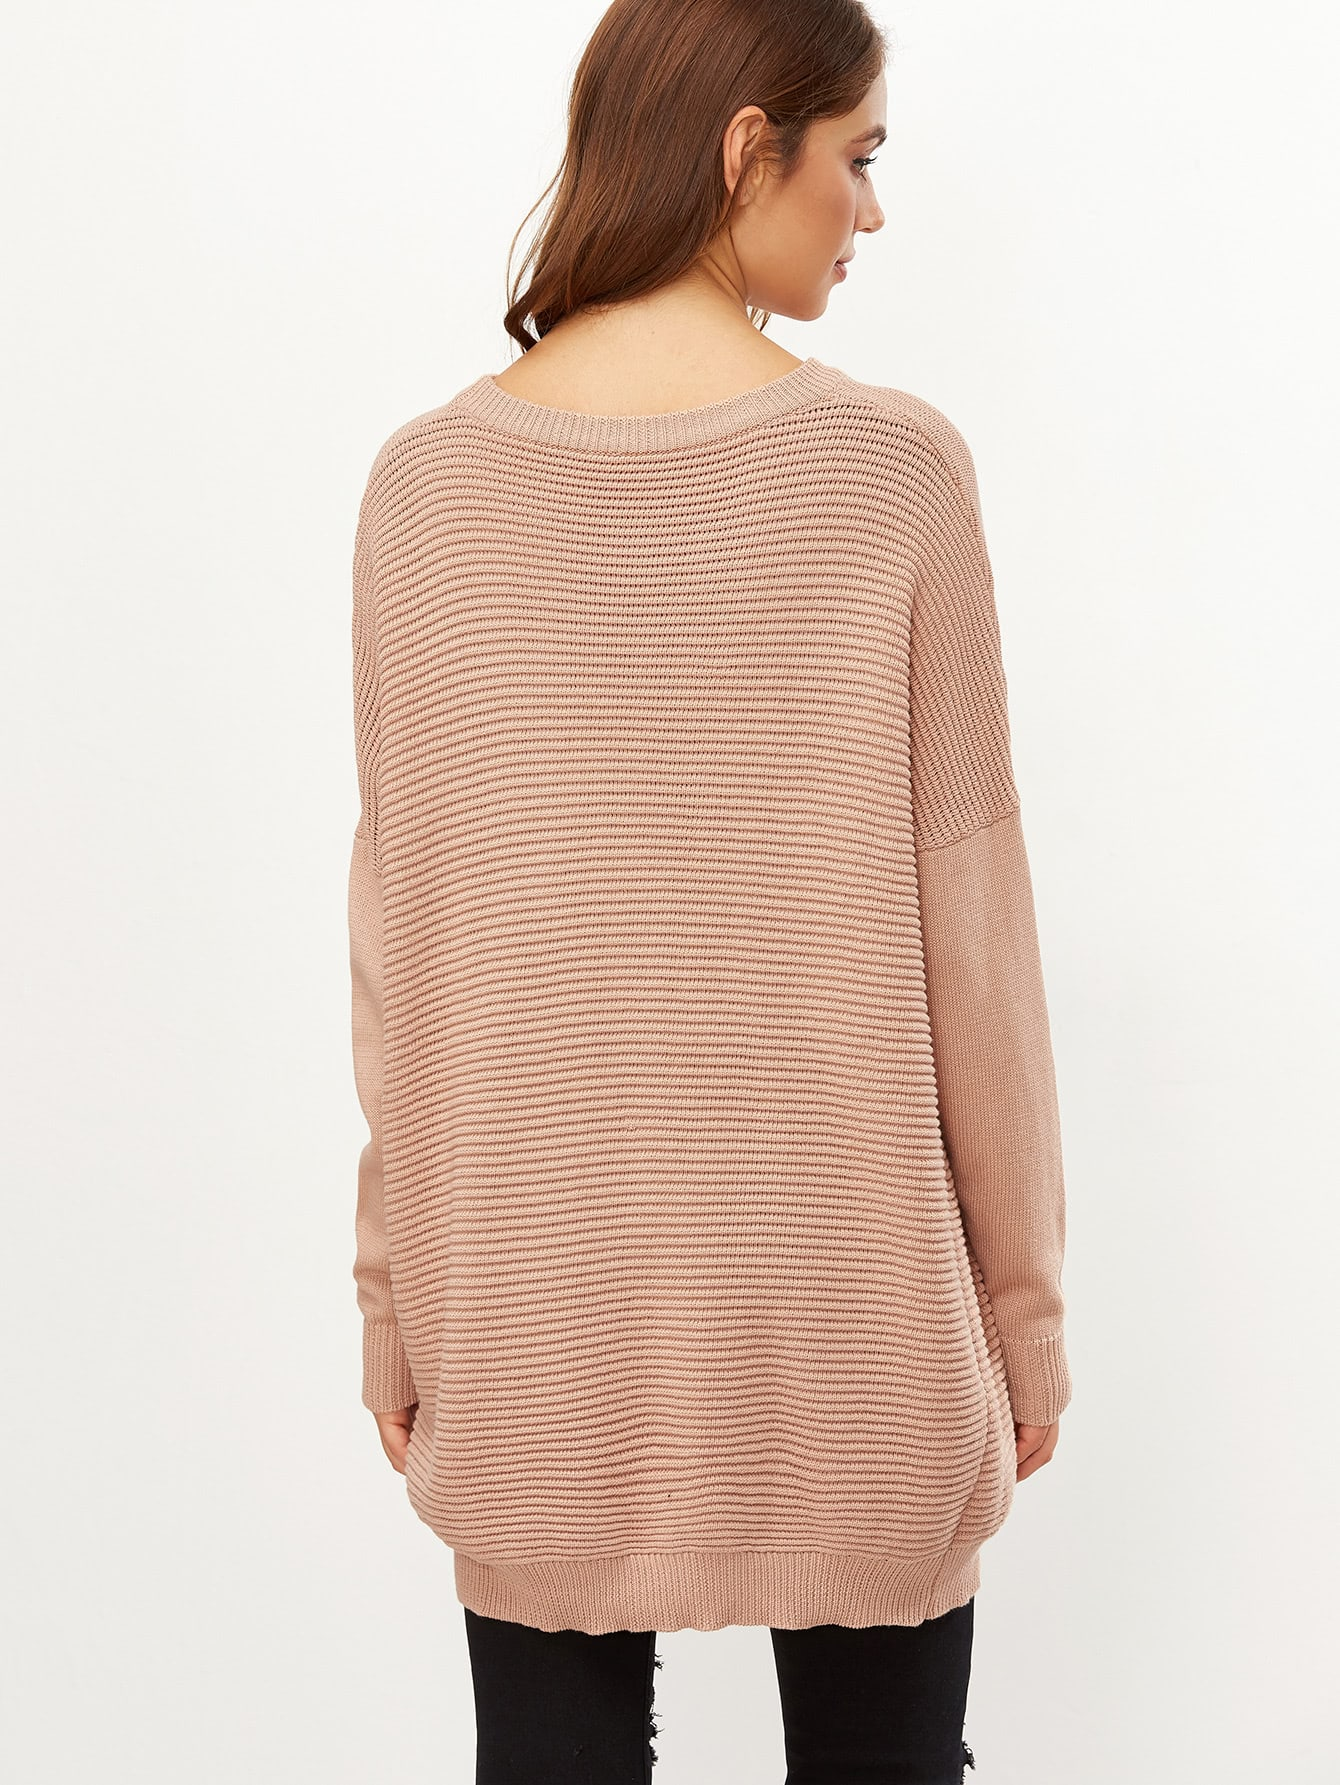 sweater161107466_2